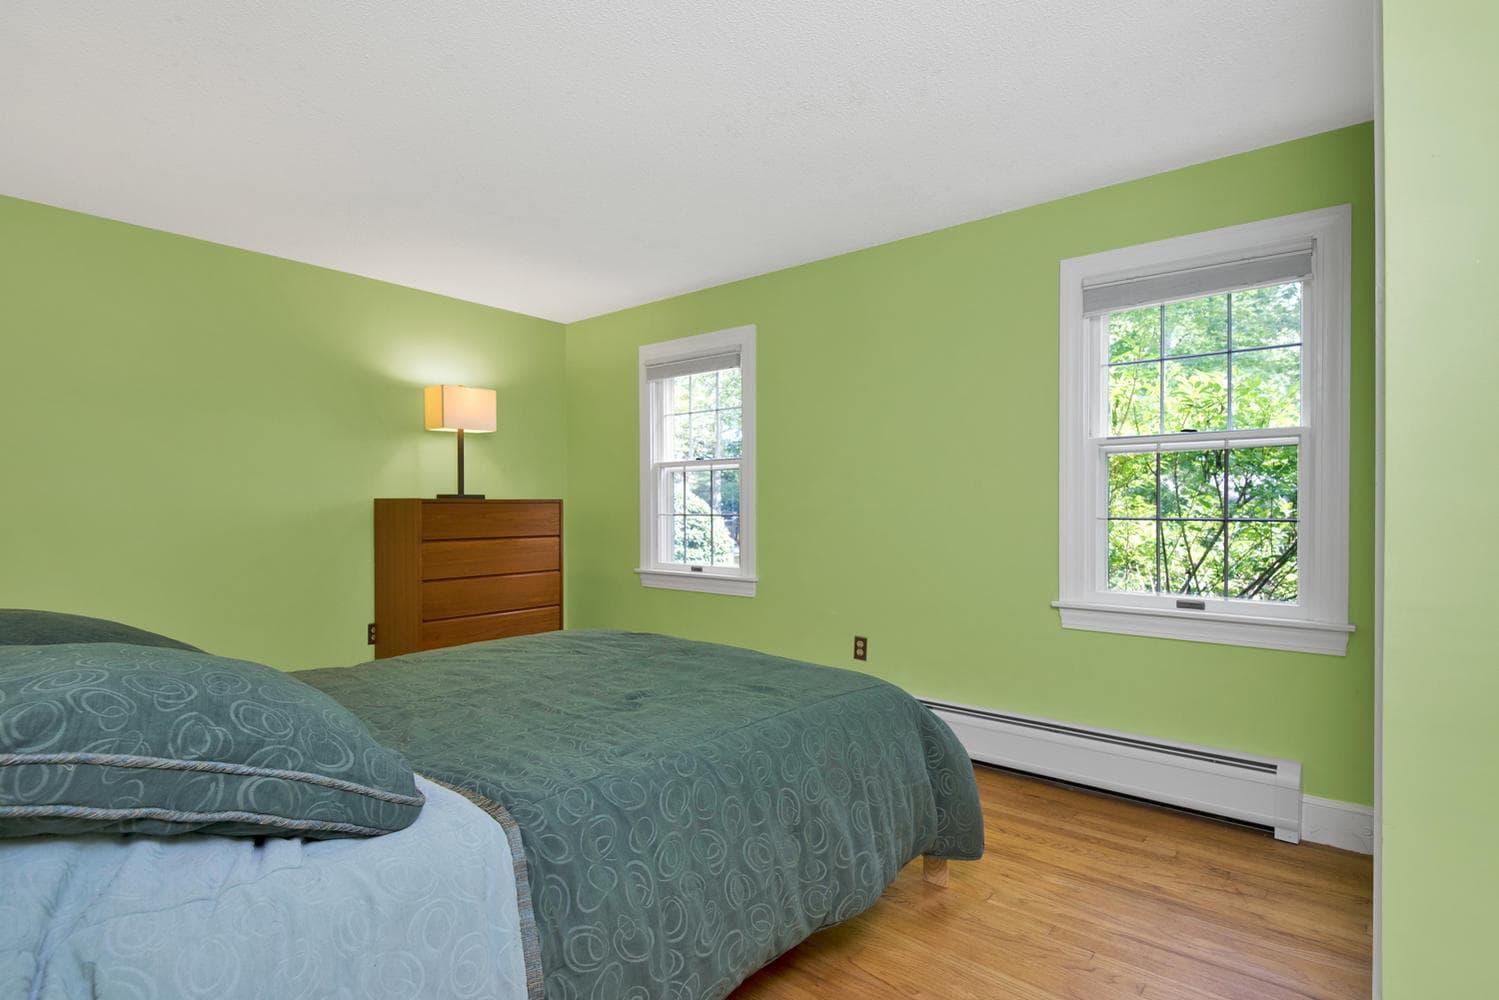 16 Applegate Ln Falmouth ME-large-019-27-Master Bedroom-1499x1000-72dpi.jpg